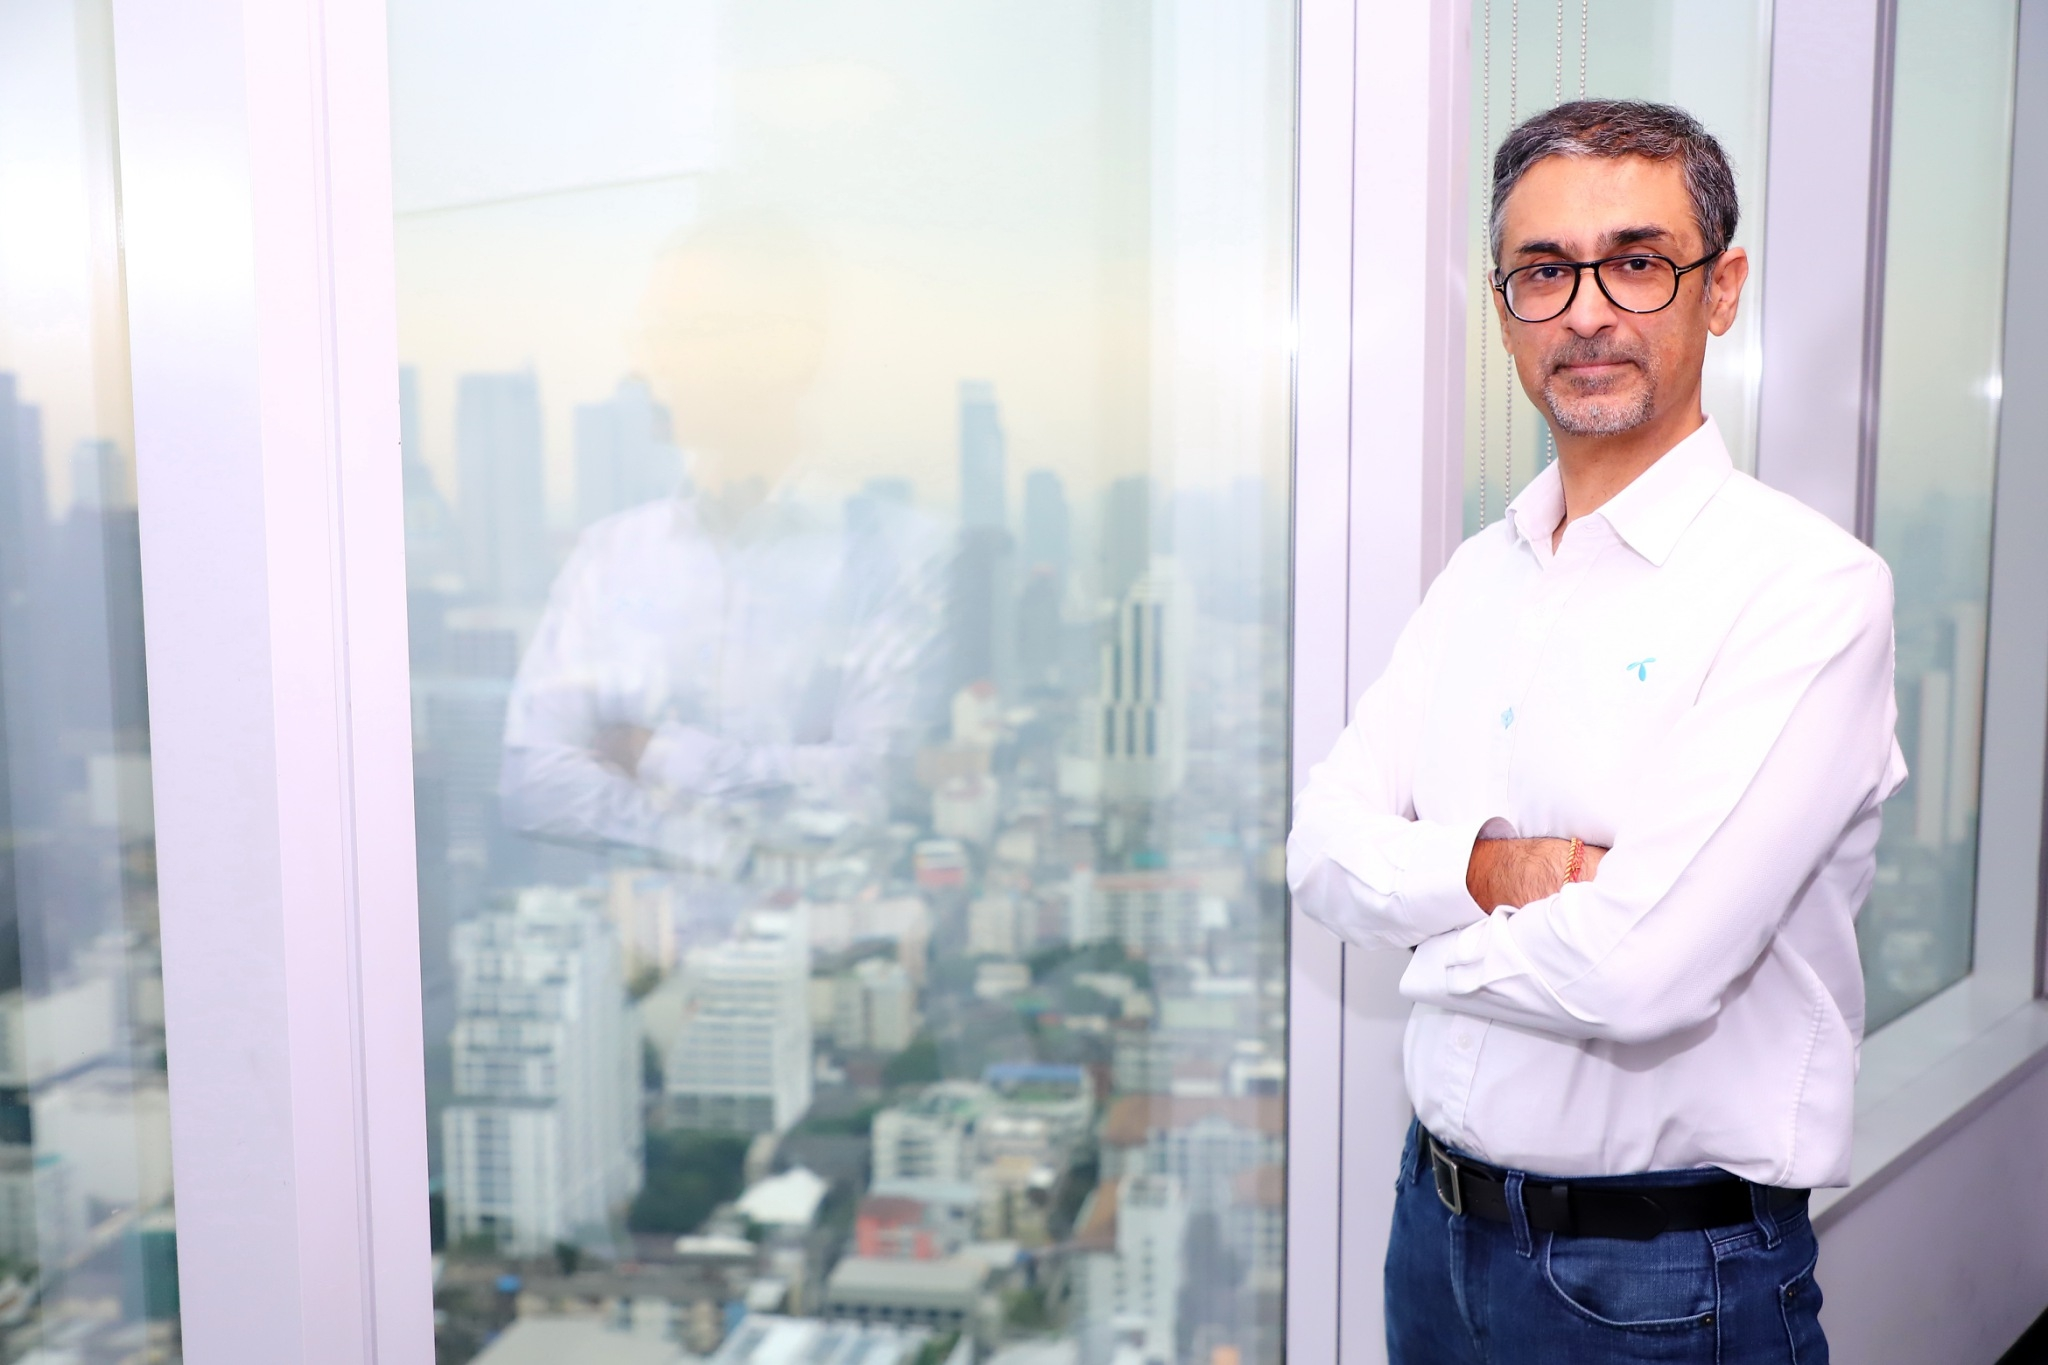 dtac business จับมือ Google Cloud ช่วย SME ไทยในช่วงล็อคดาวน์และ WFH